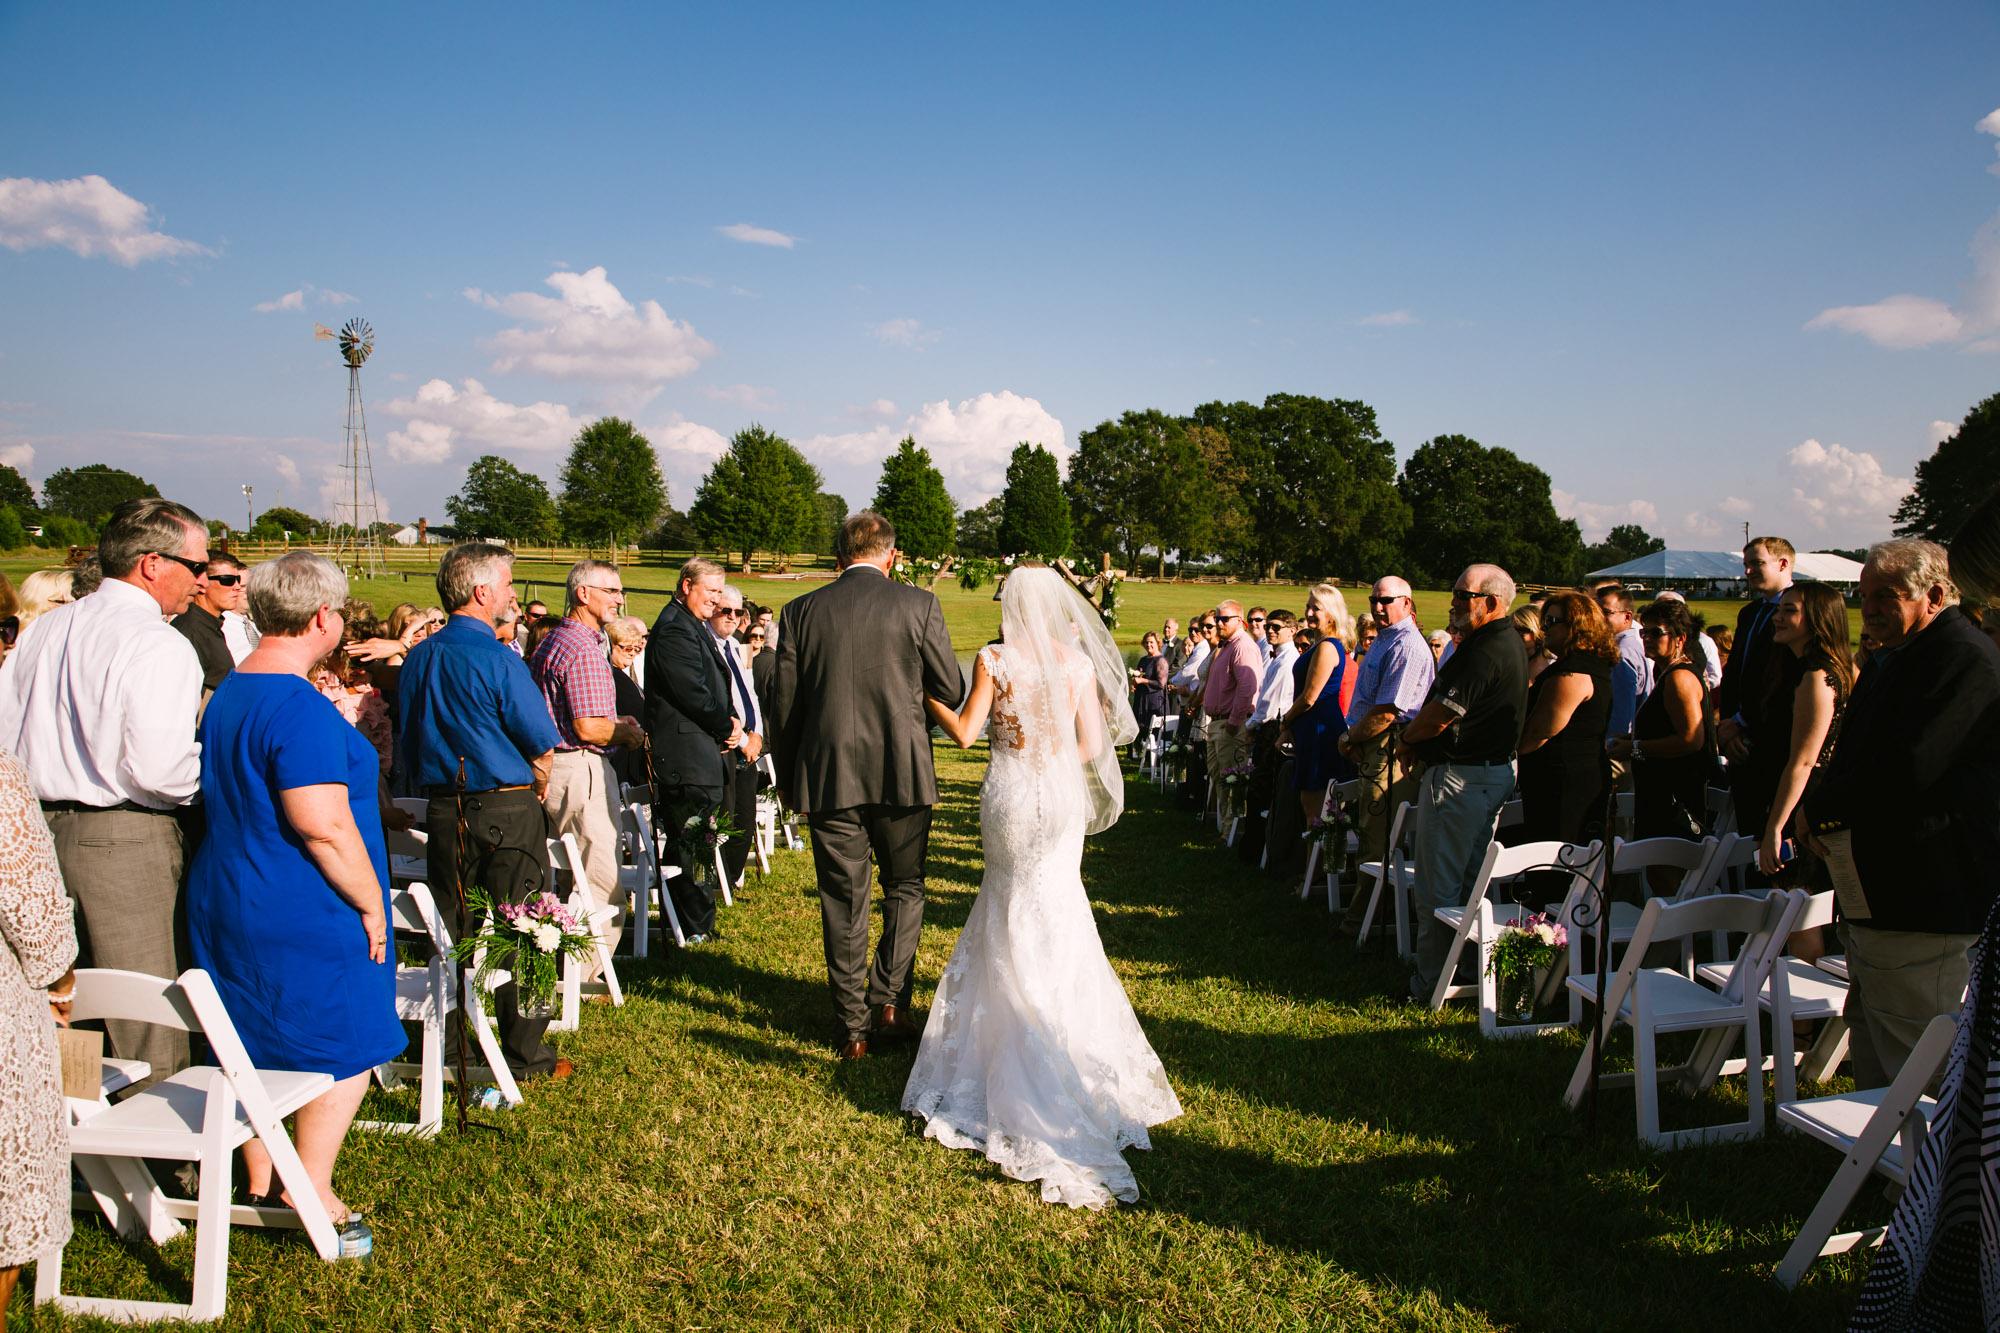 Waynesville, NC Wedding Photography | Wedding Ceremony Bride's Entrance